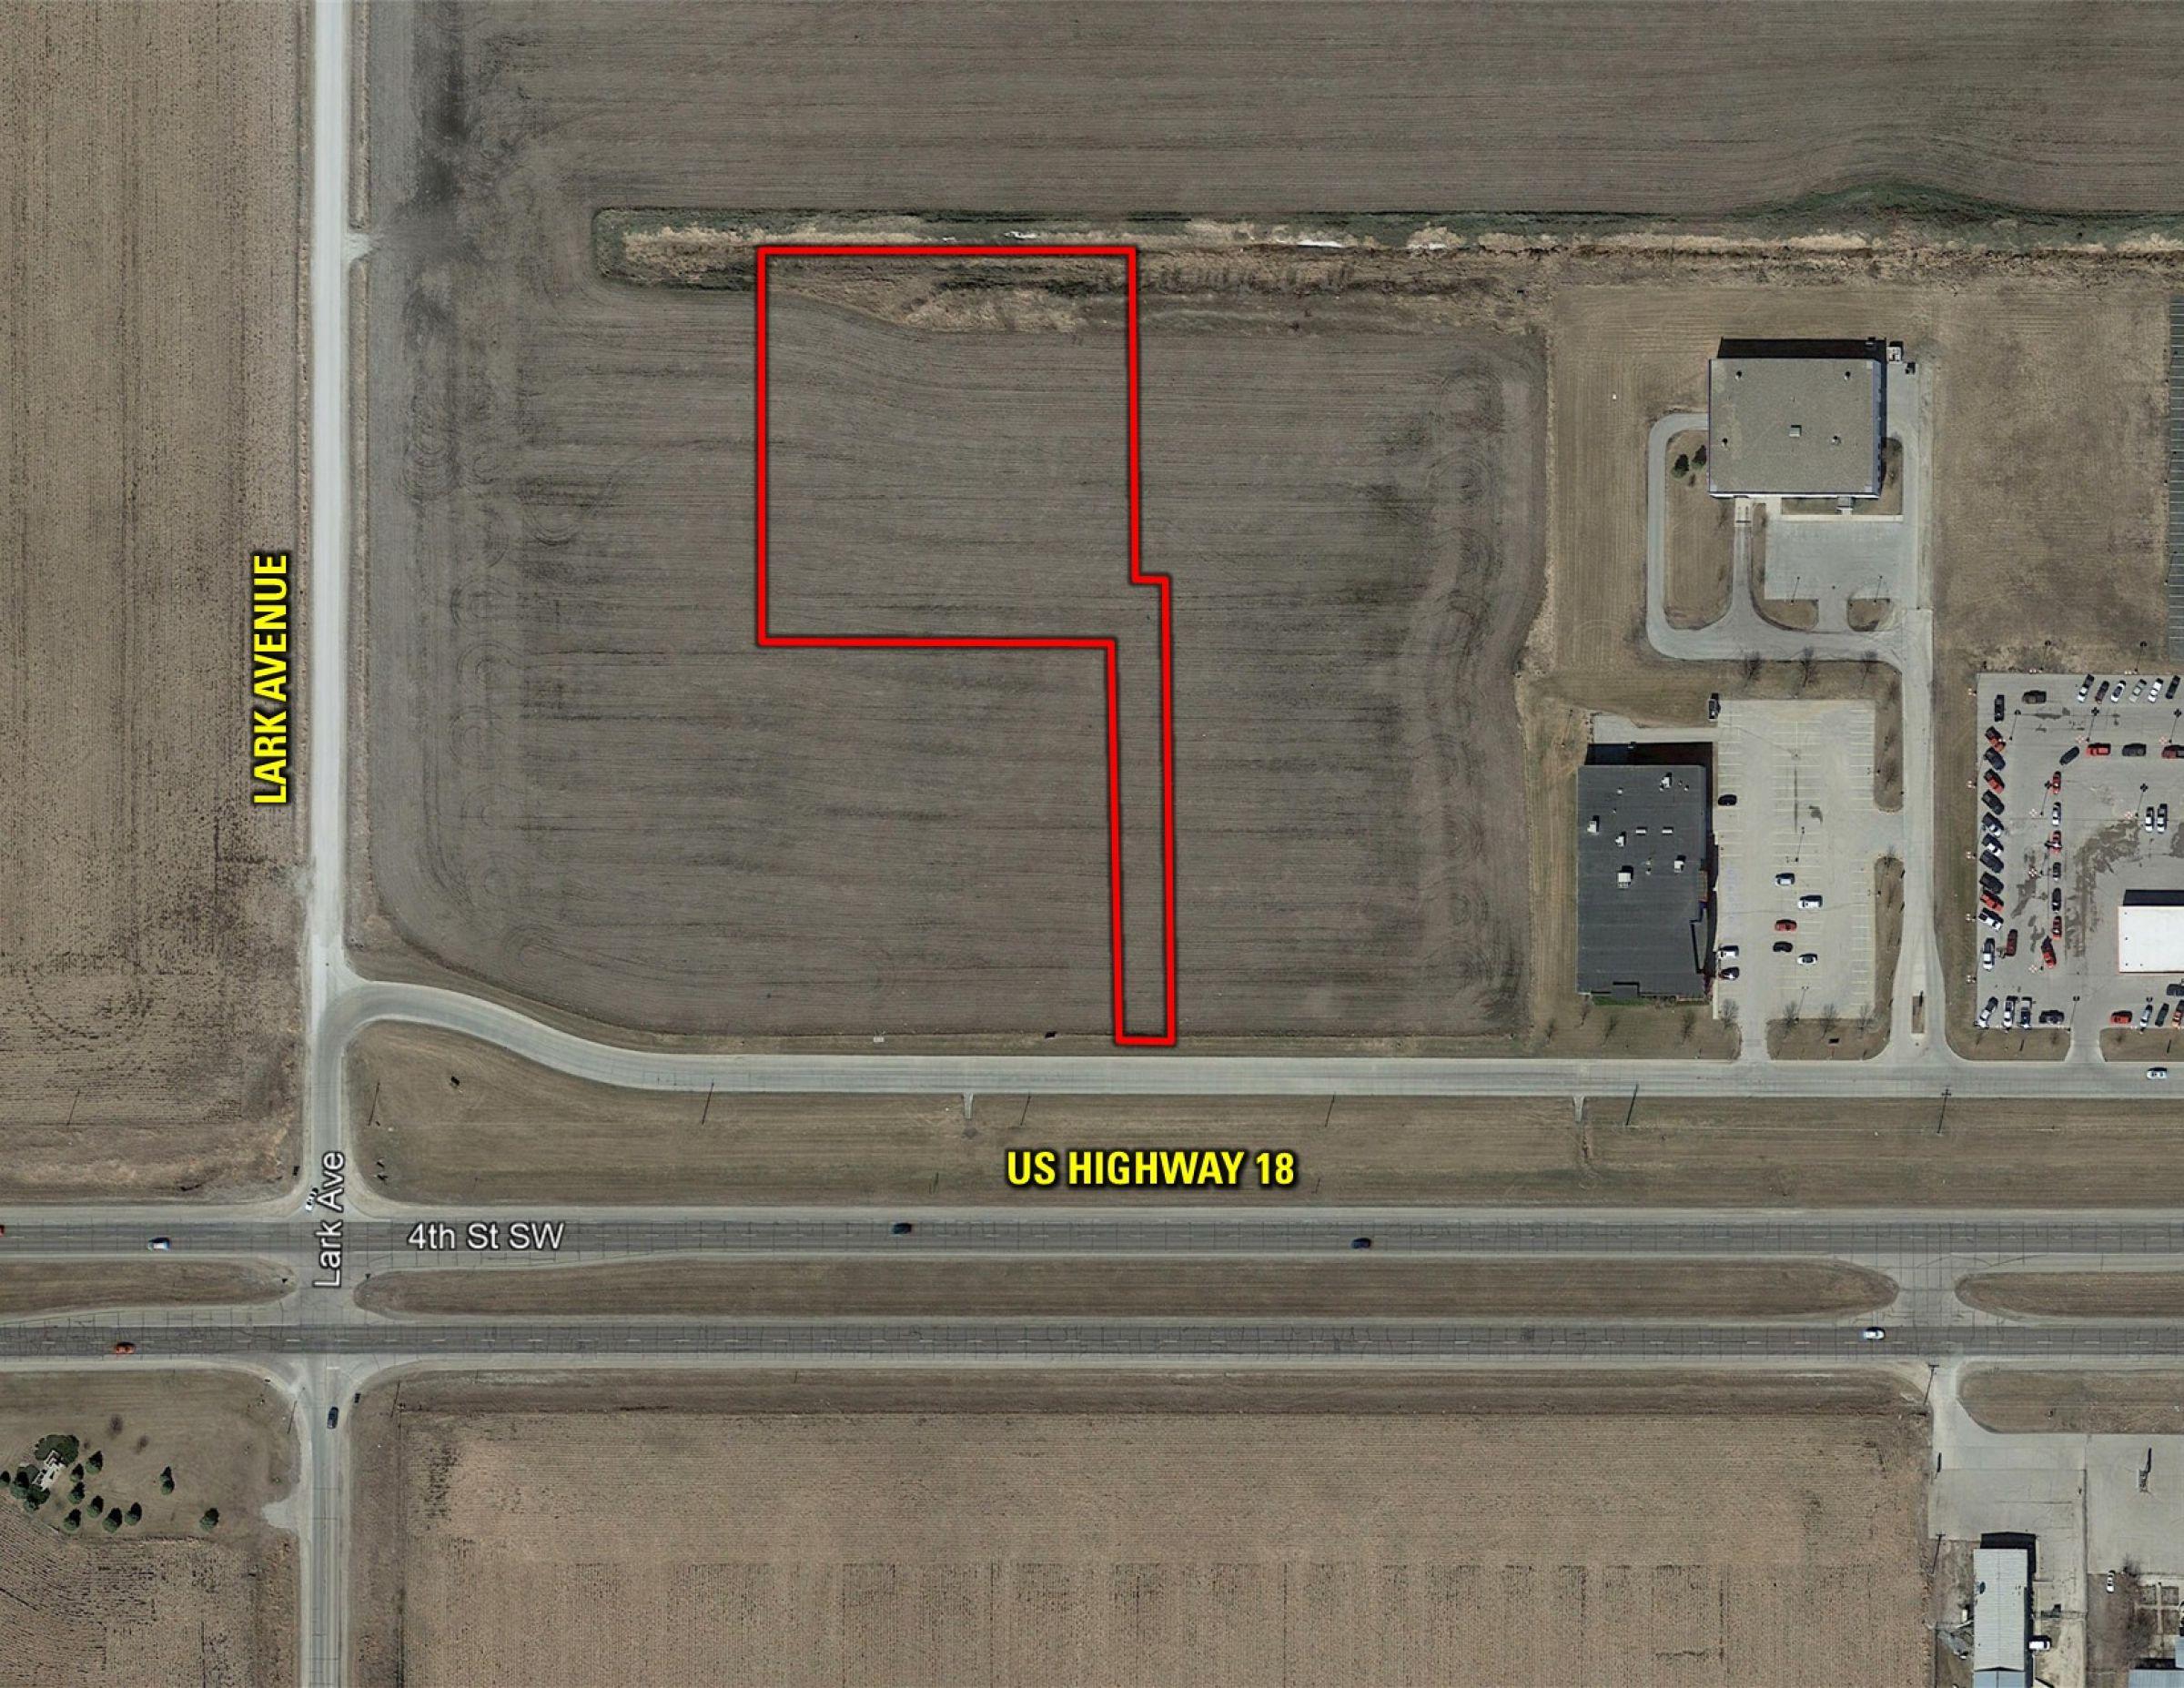 development-land-commercial-cerro-gordo-county-iowa-3-acres-listing-number-15643-0-2021-07-20-165026.jpg